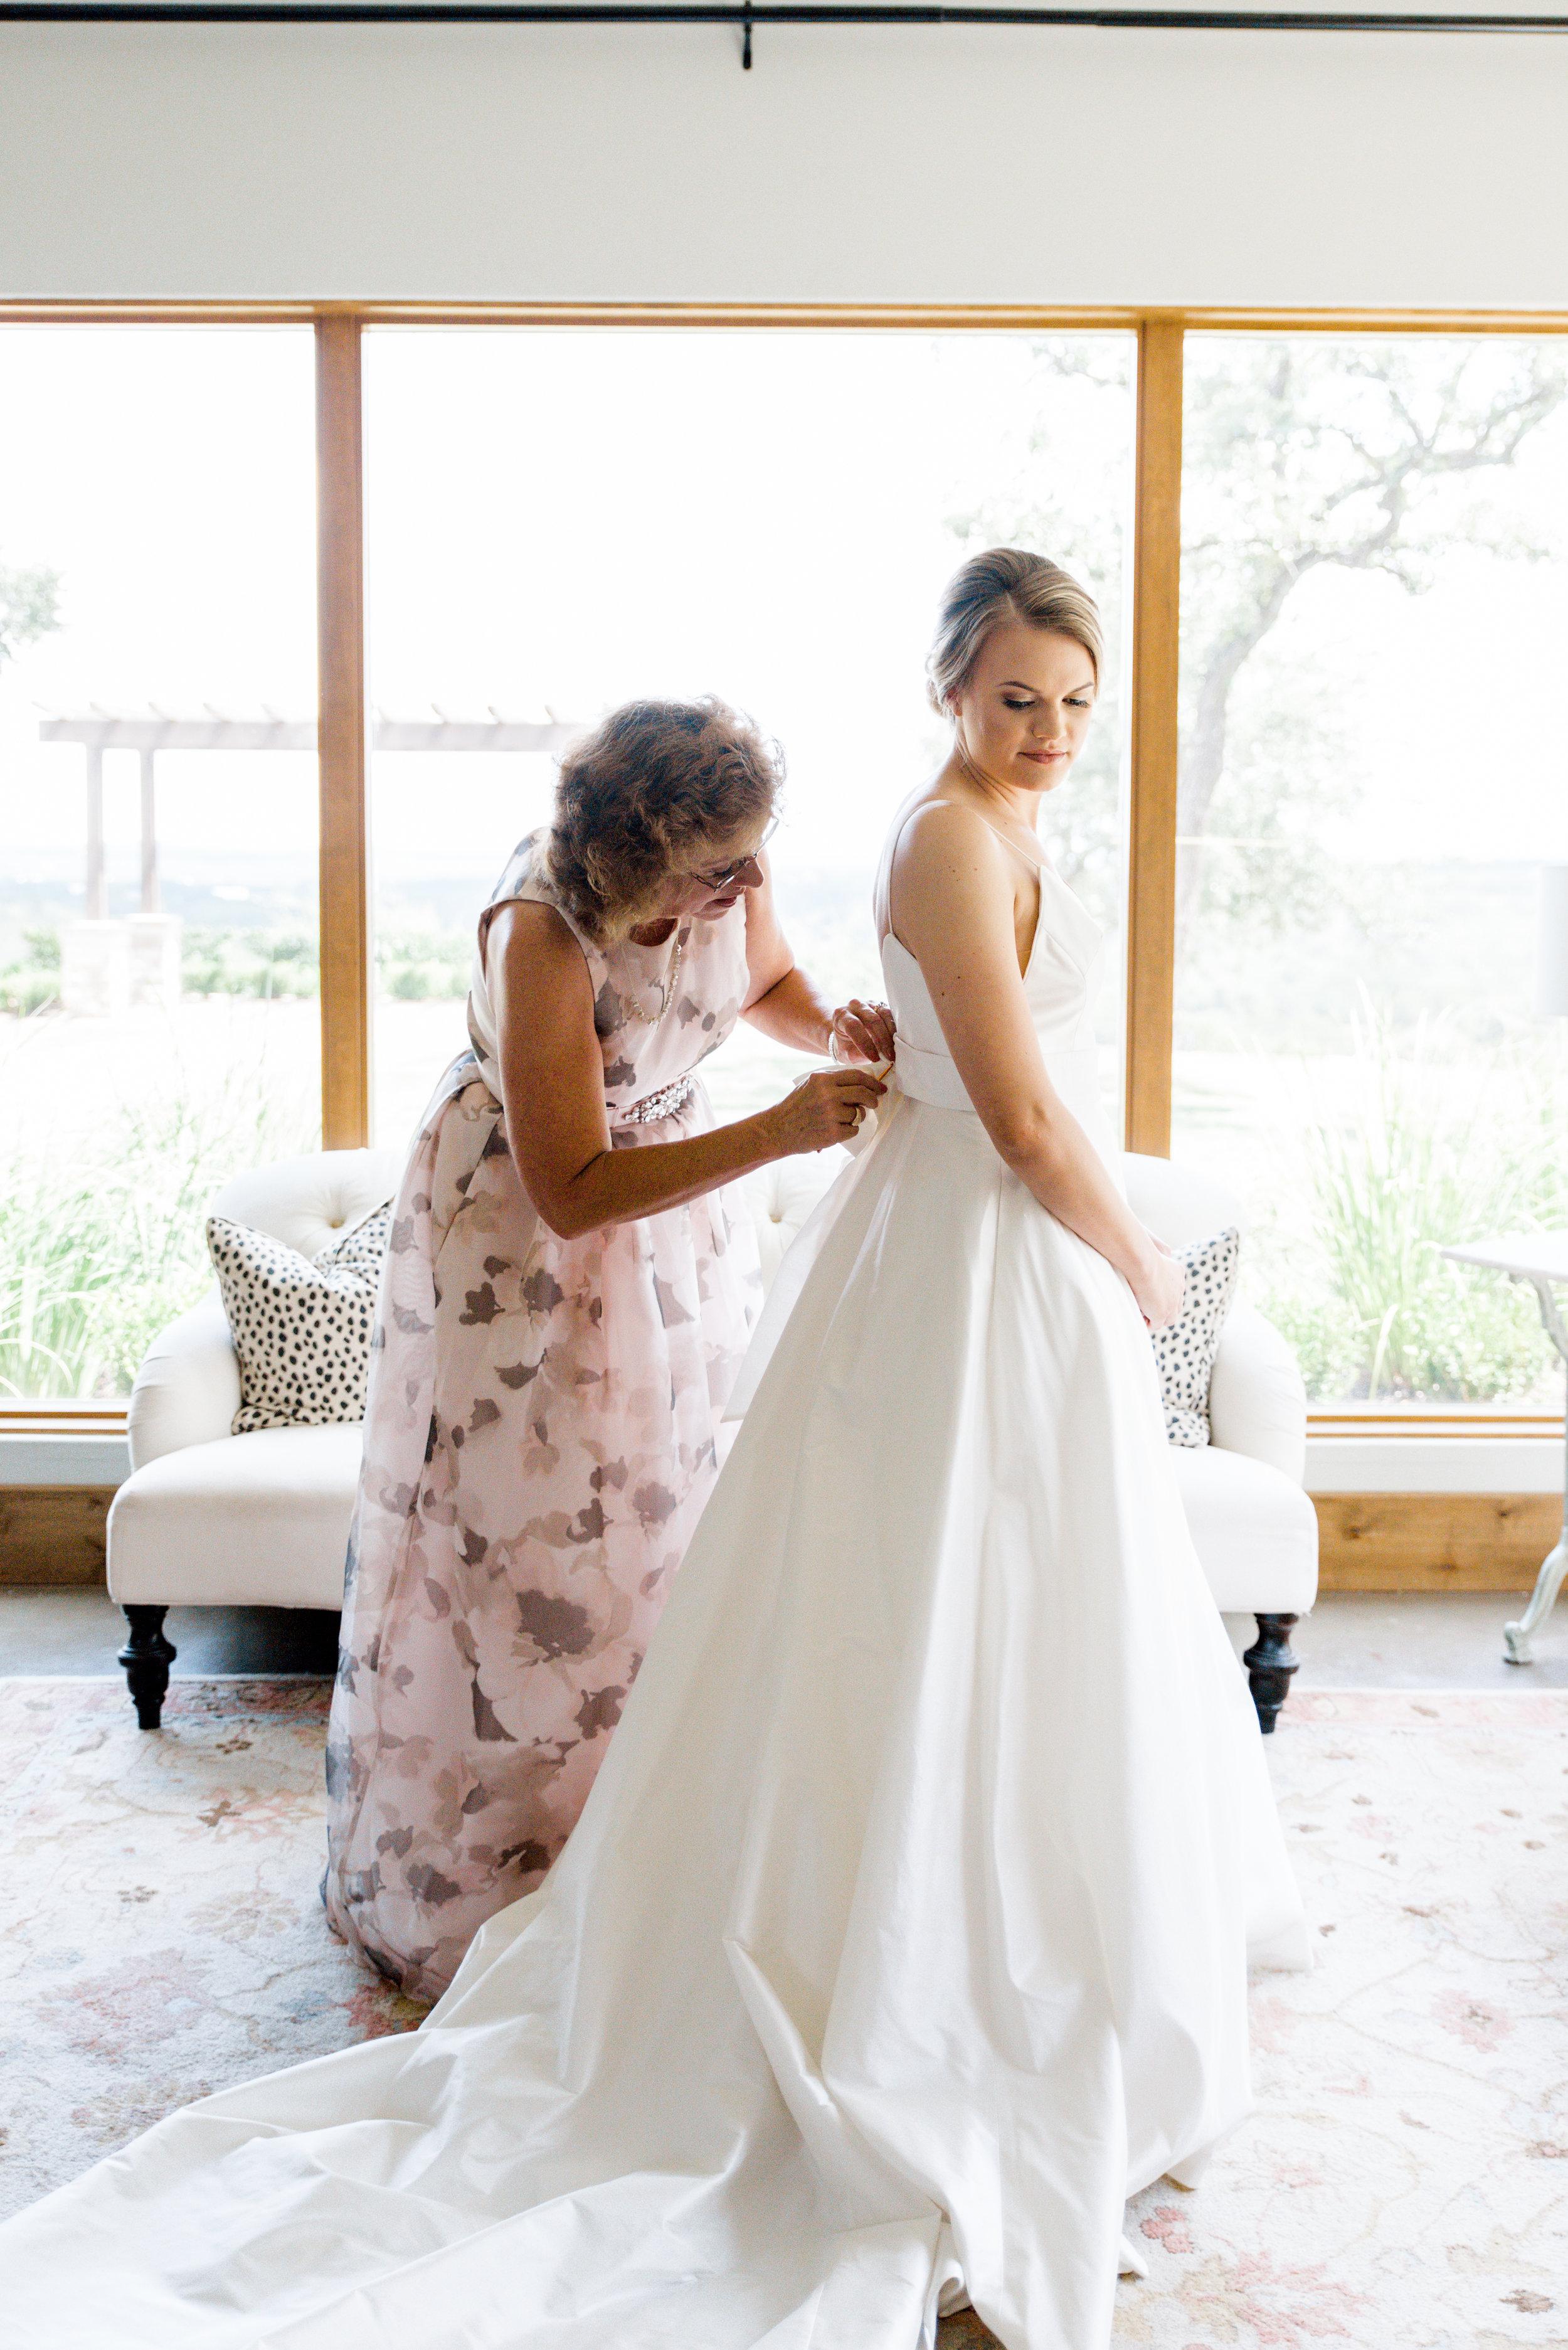 bride mom getting ready image texas austin wedding planner coordinator epoch co erin elizabeth photography canyonwood ridge